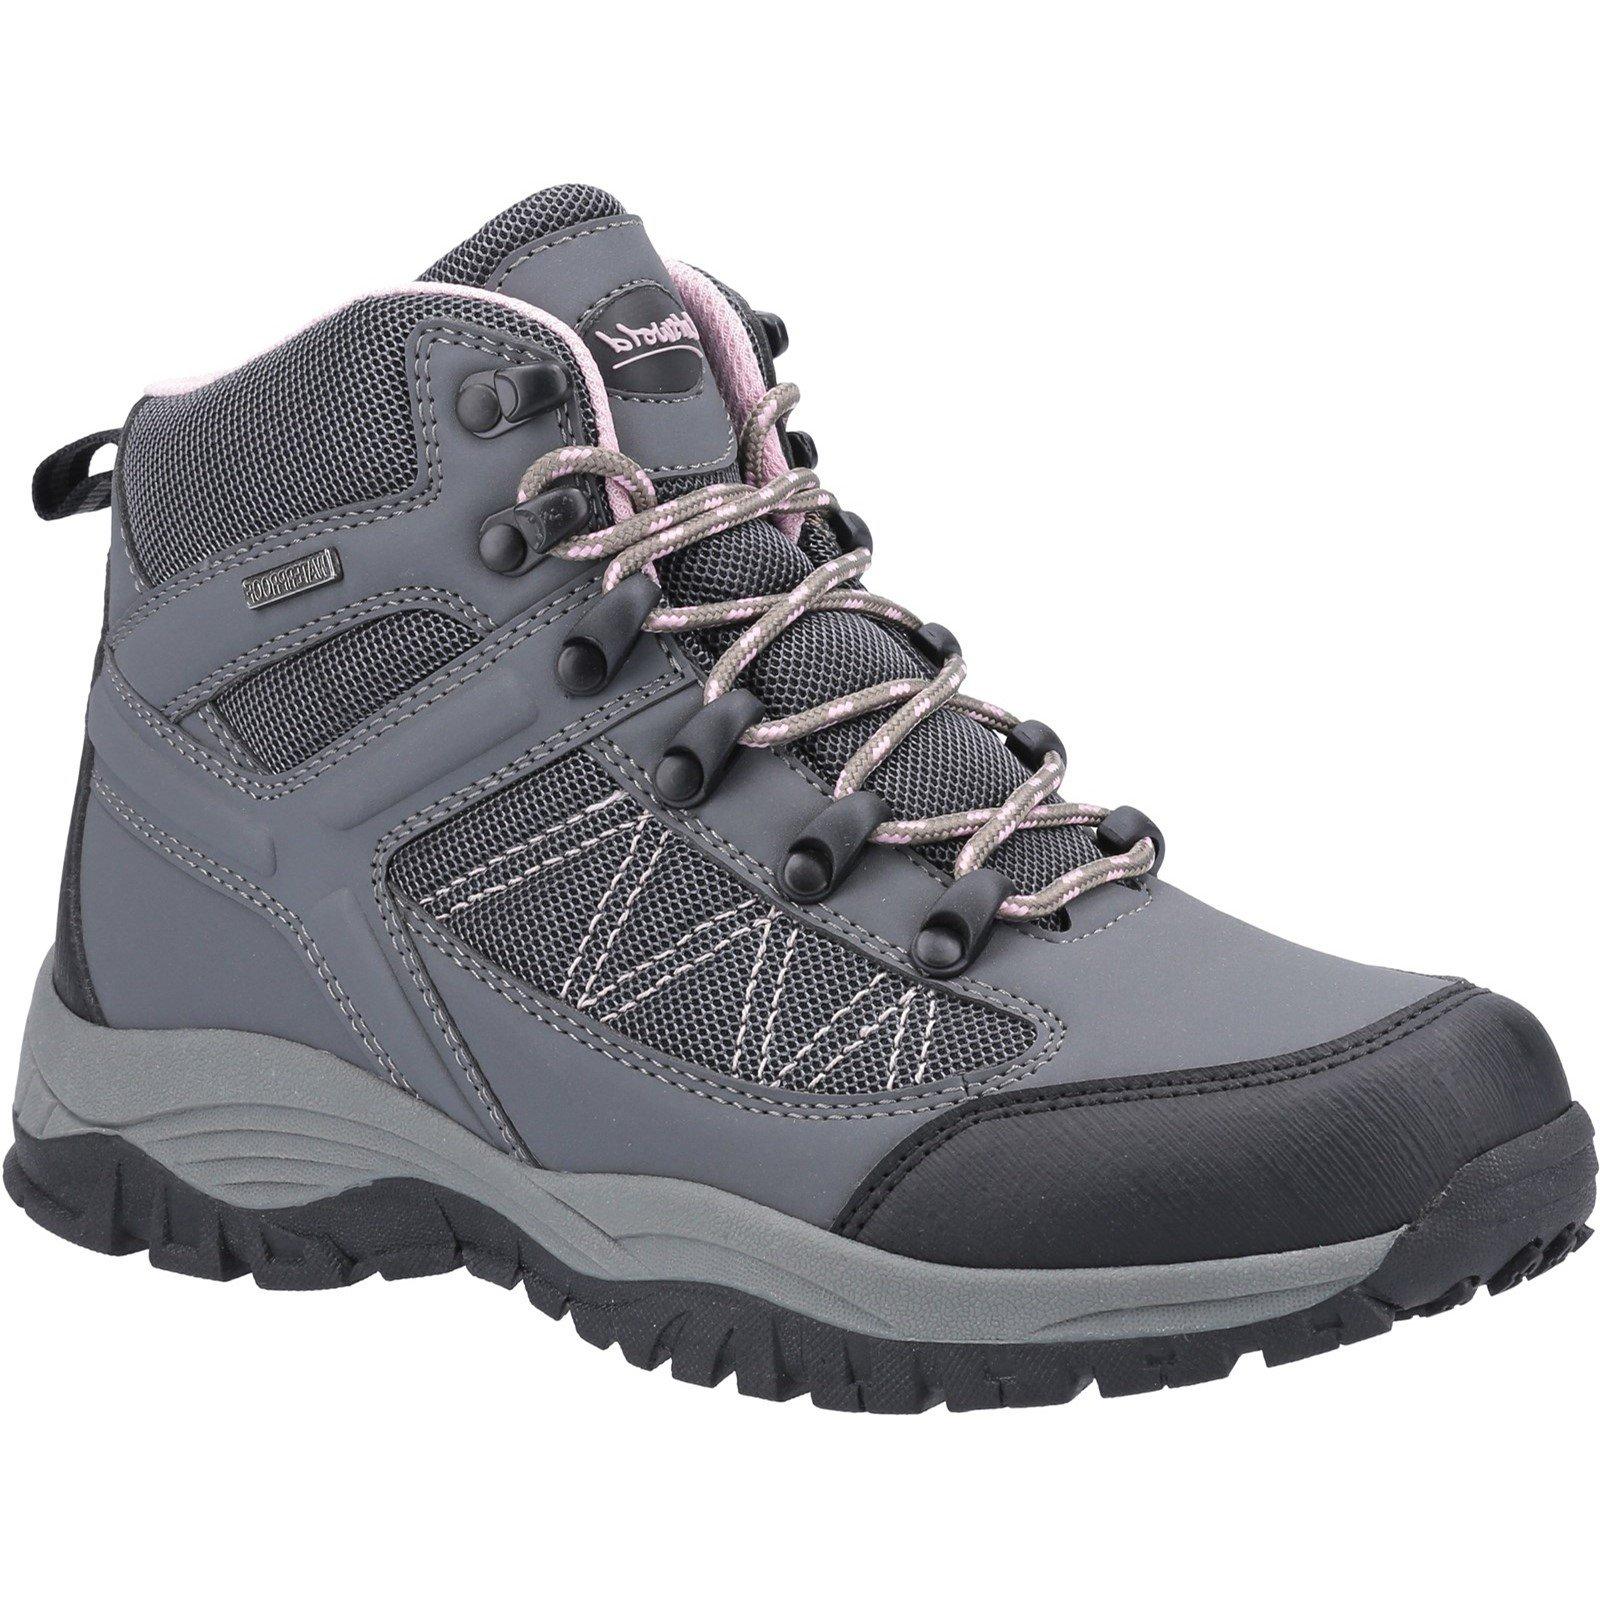 Cotswold Women's Maisemore Hiking Boot Grey 32986 - Grey 8